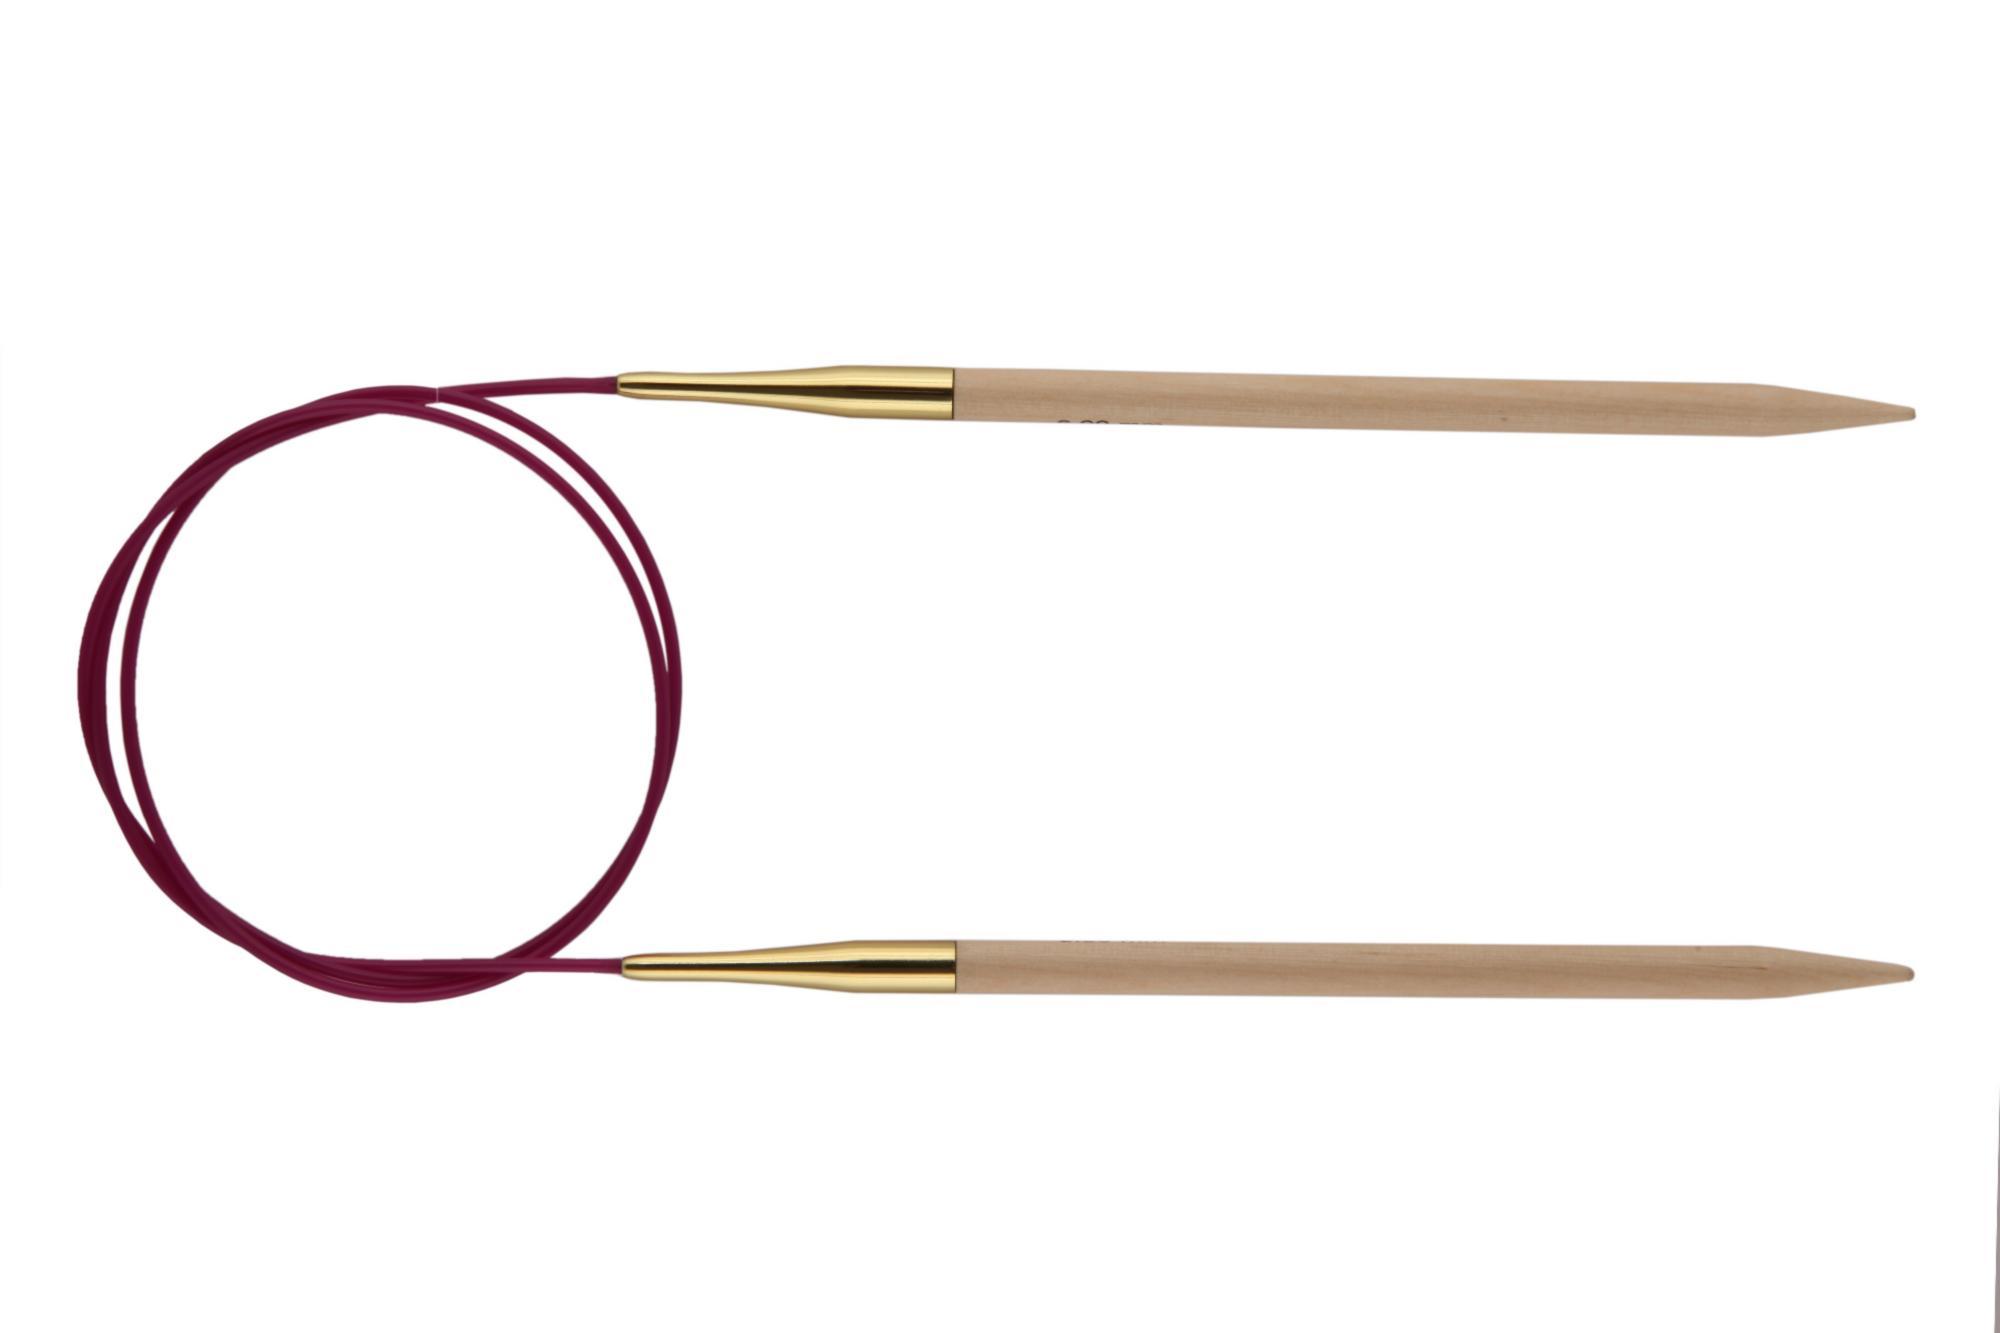 Спицы круговые 120 см Basix Birch Wood KnitPro, 35353, 6.50 мм